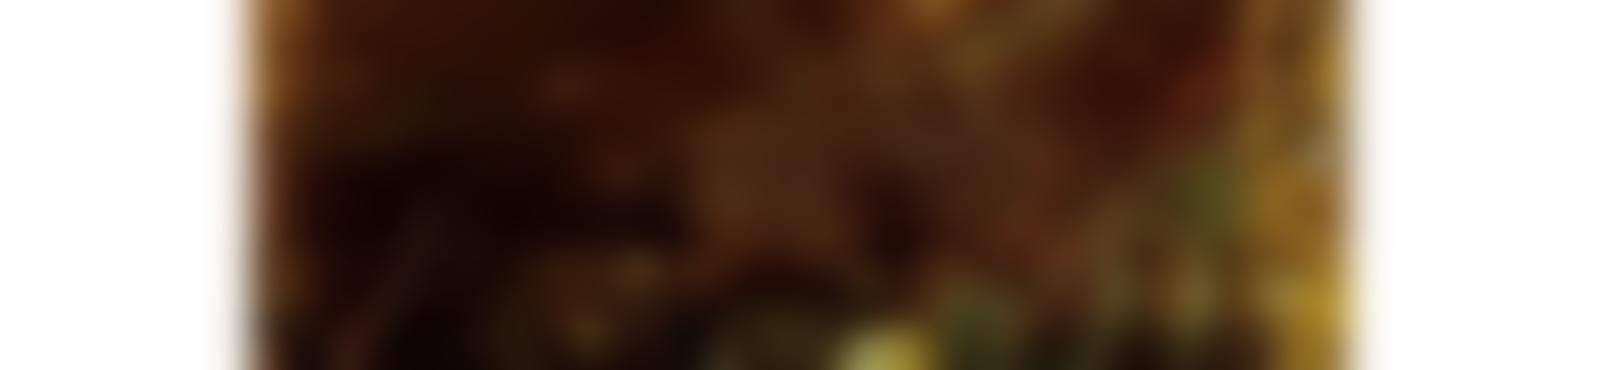 Blurred ddd9d7ba e7e6 4662 95ad 5cf1f296970a